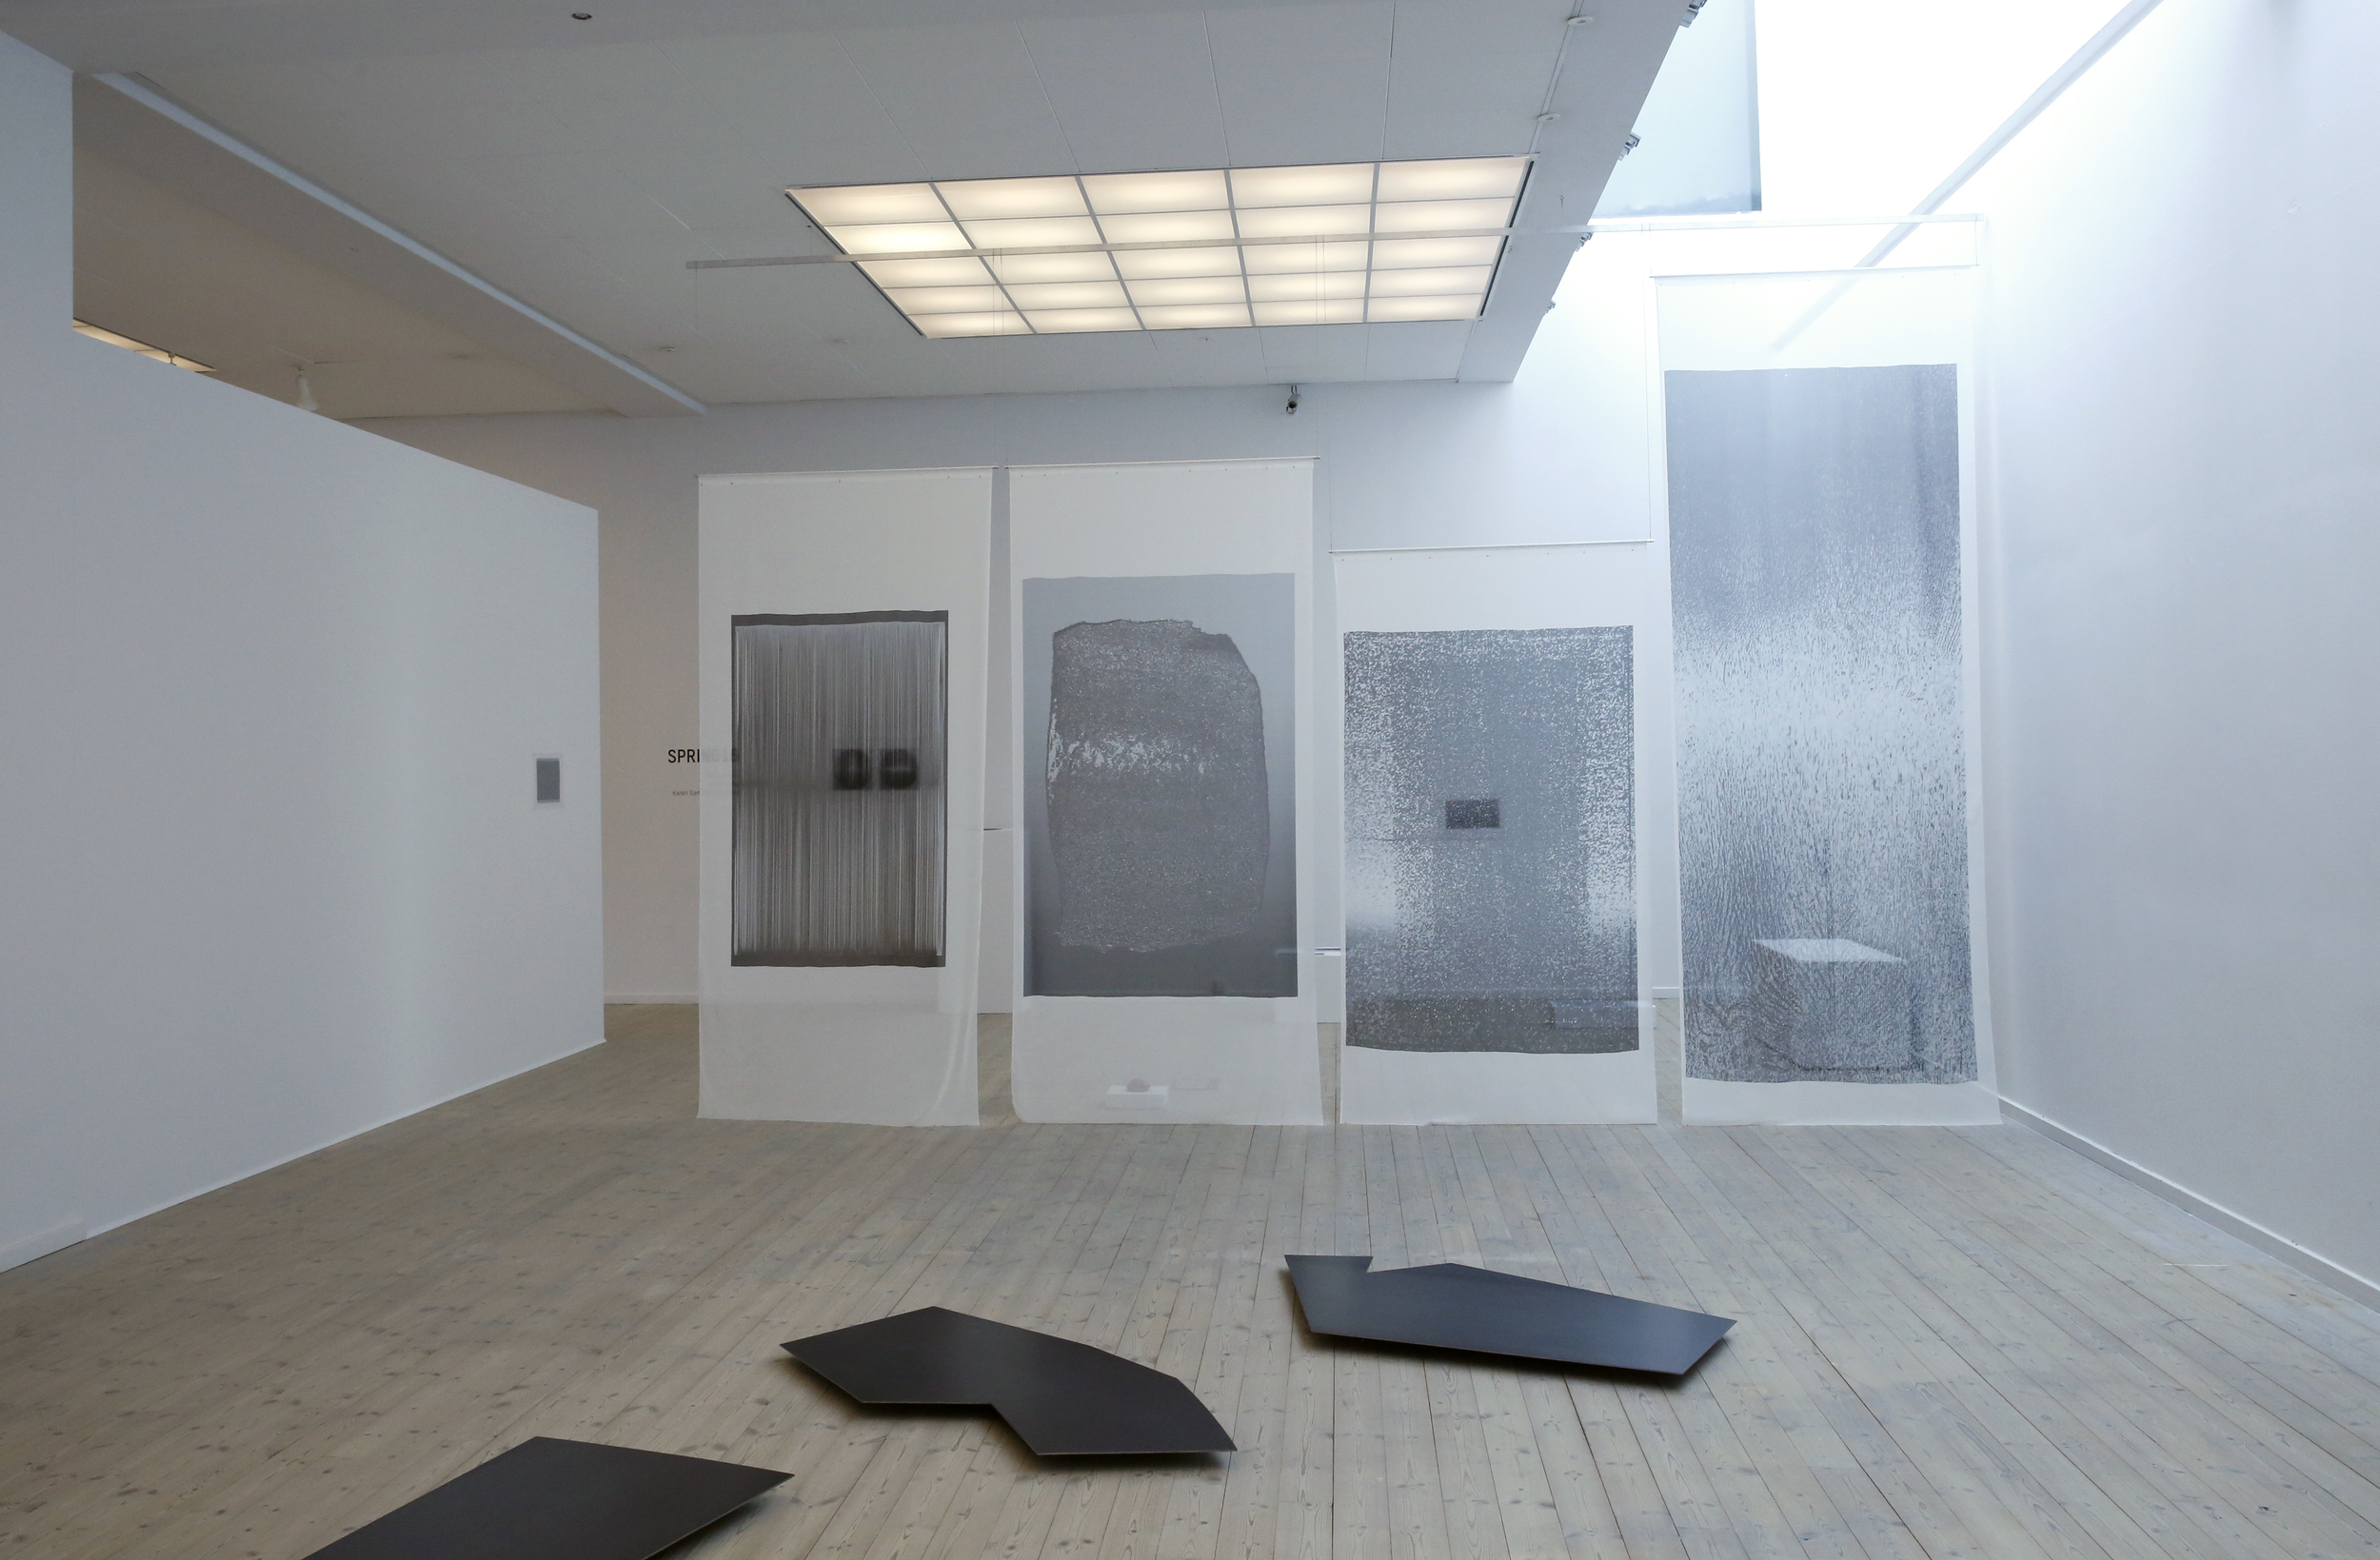 SPRING udstillingsblik foto: Ricarda Bross for Kunsthal Aarhus